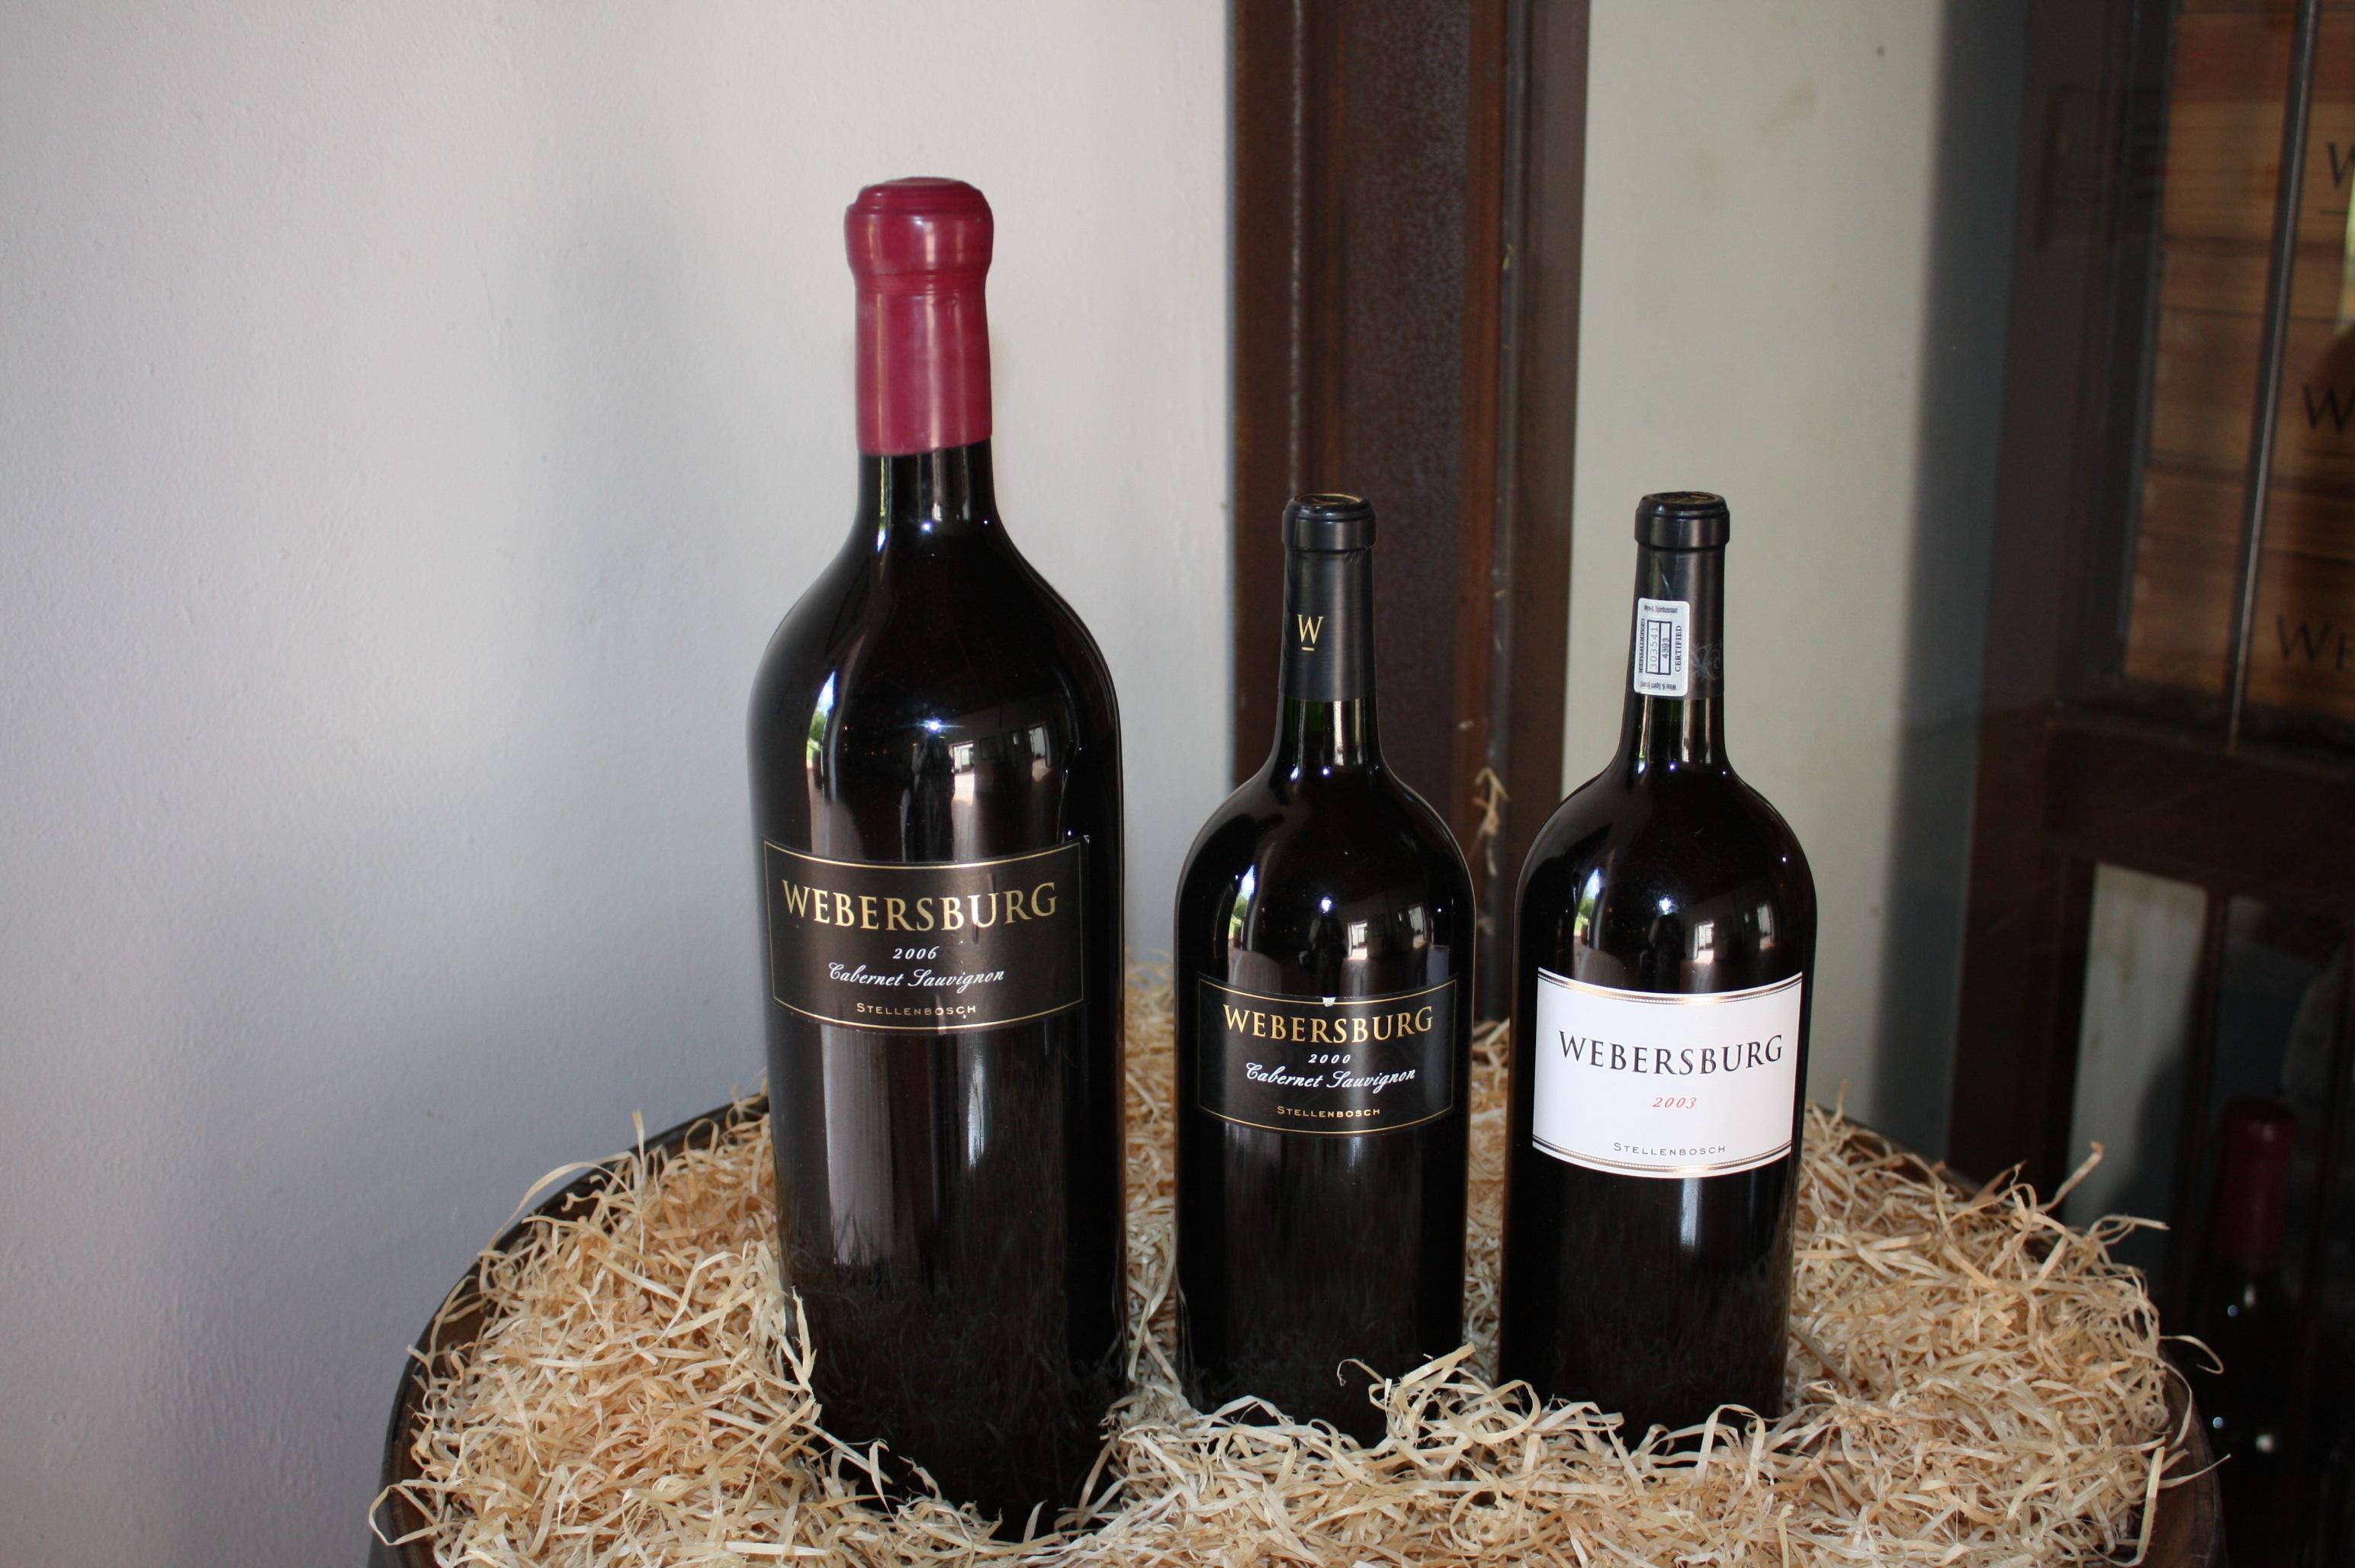 78+ Gambar Anggur Merah Orang Tua Terbaik